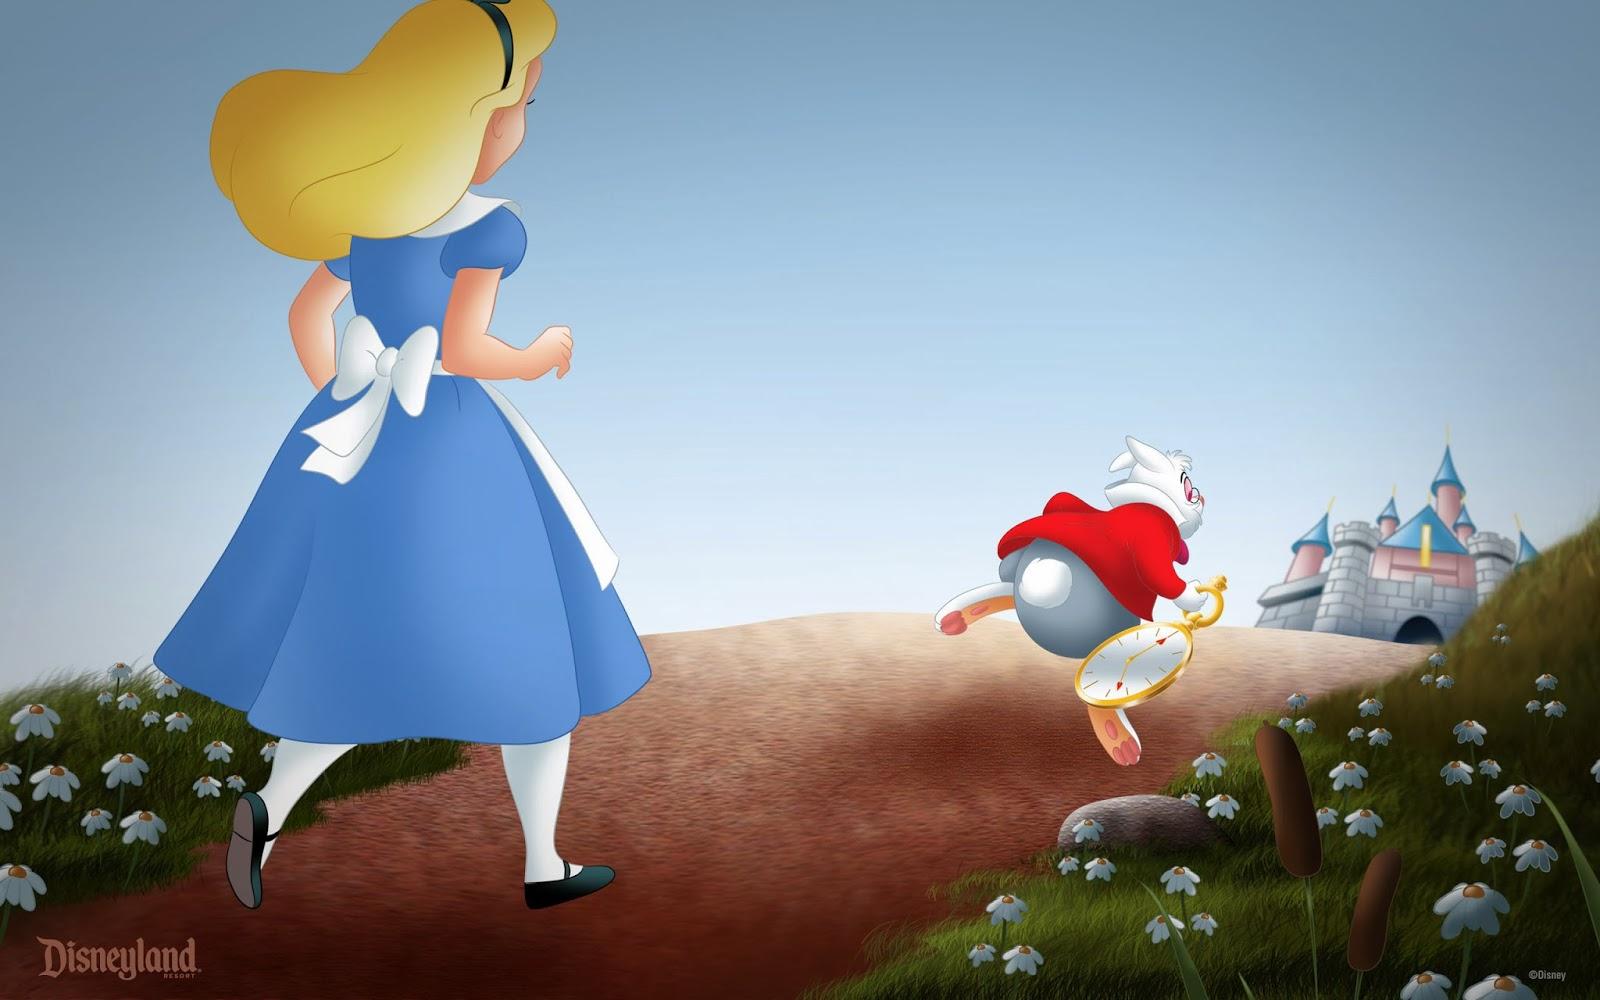 Free Download Alice In Wonderland Hd Wallpapers Cartoon Hd Desktop